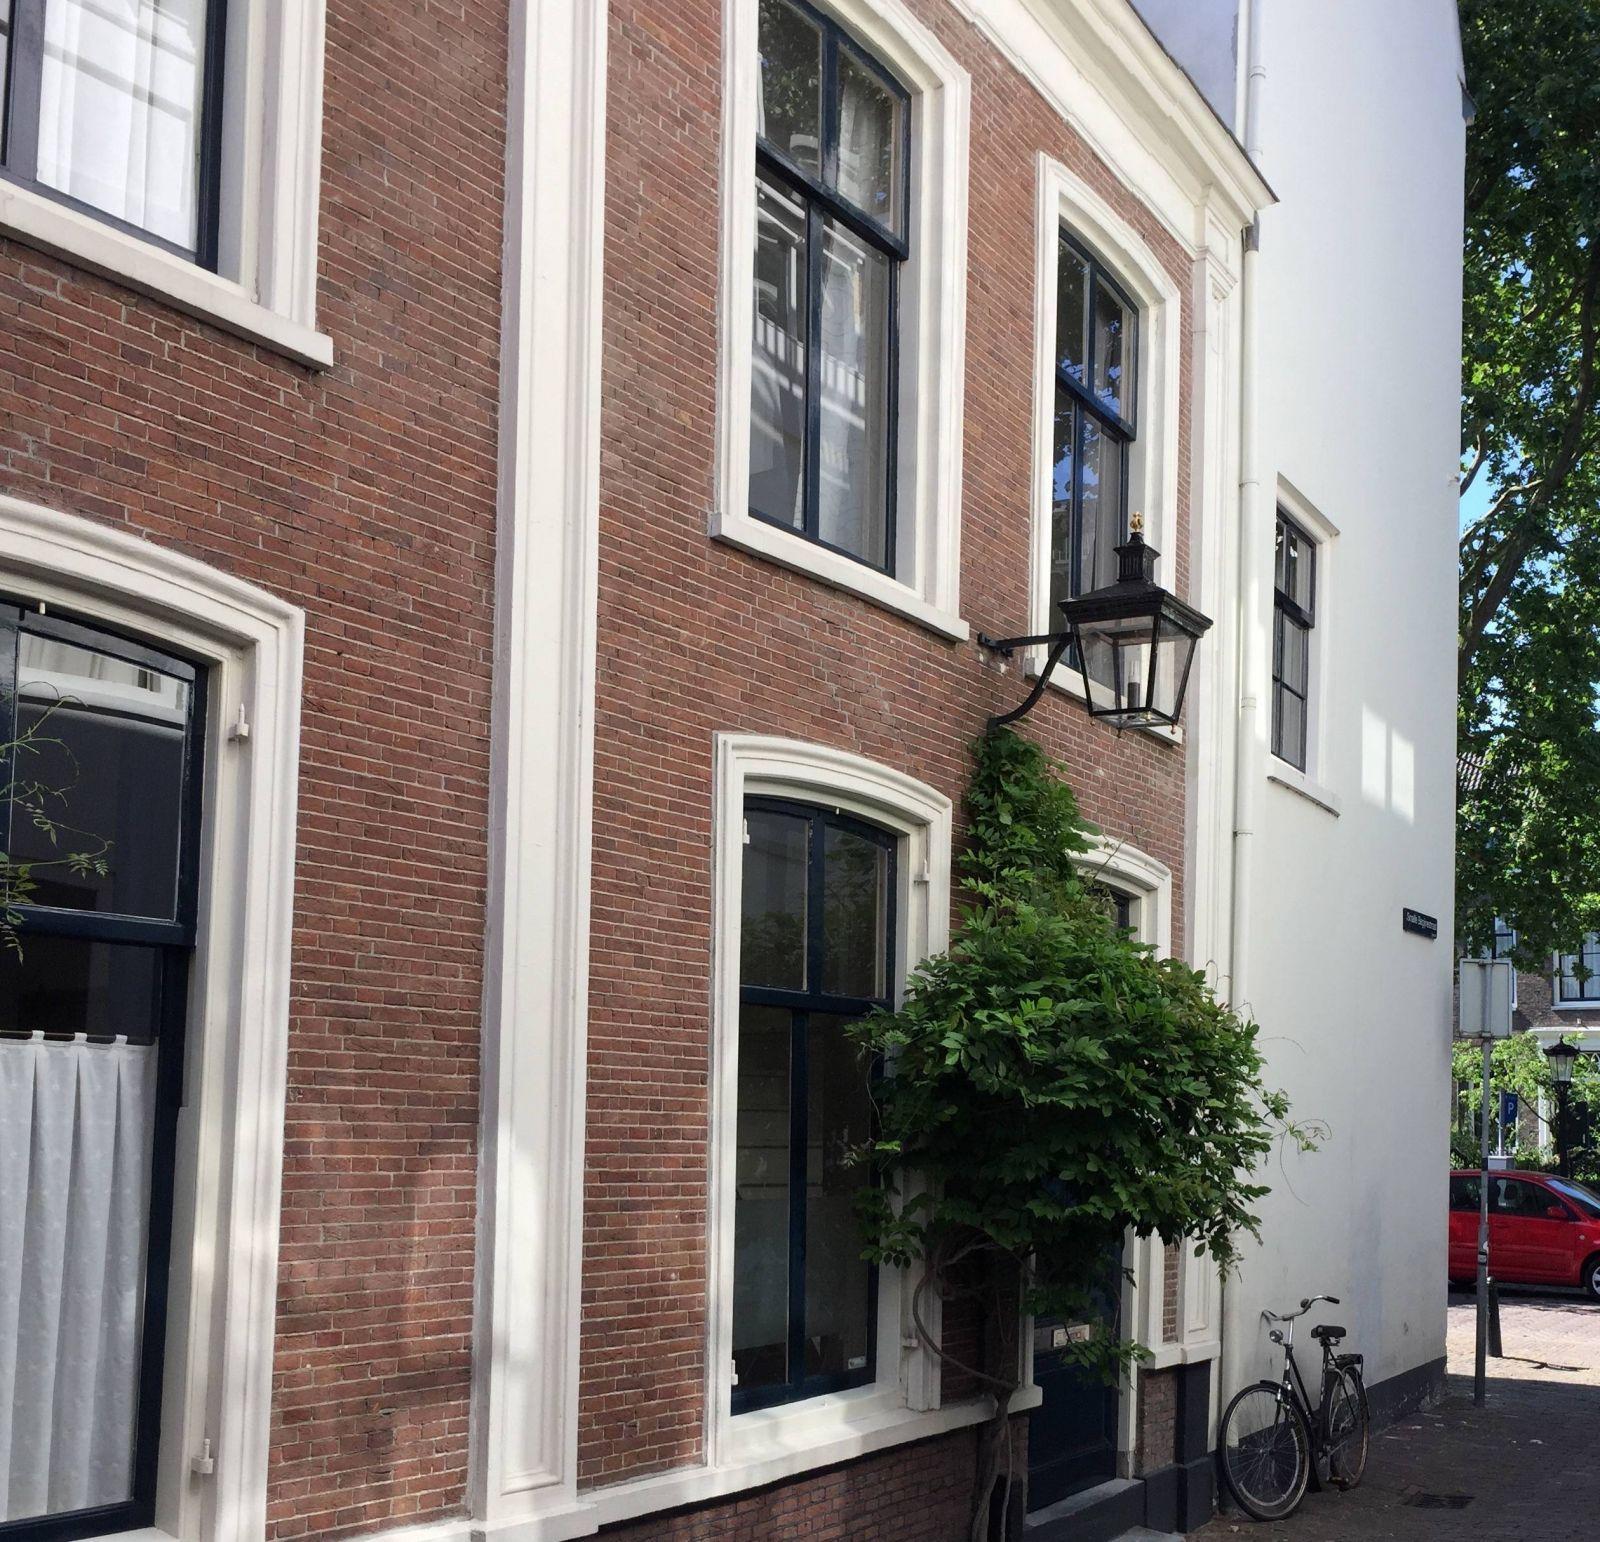 Smalle Begijnestraat 4